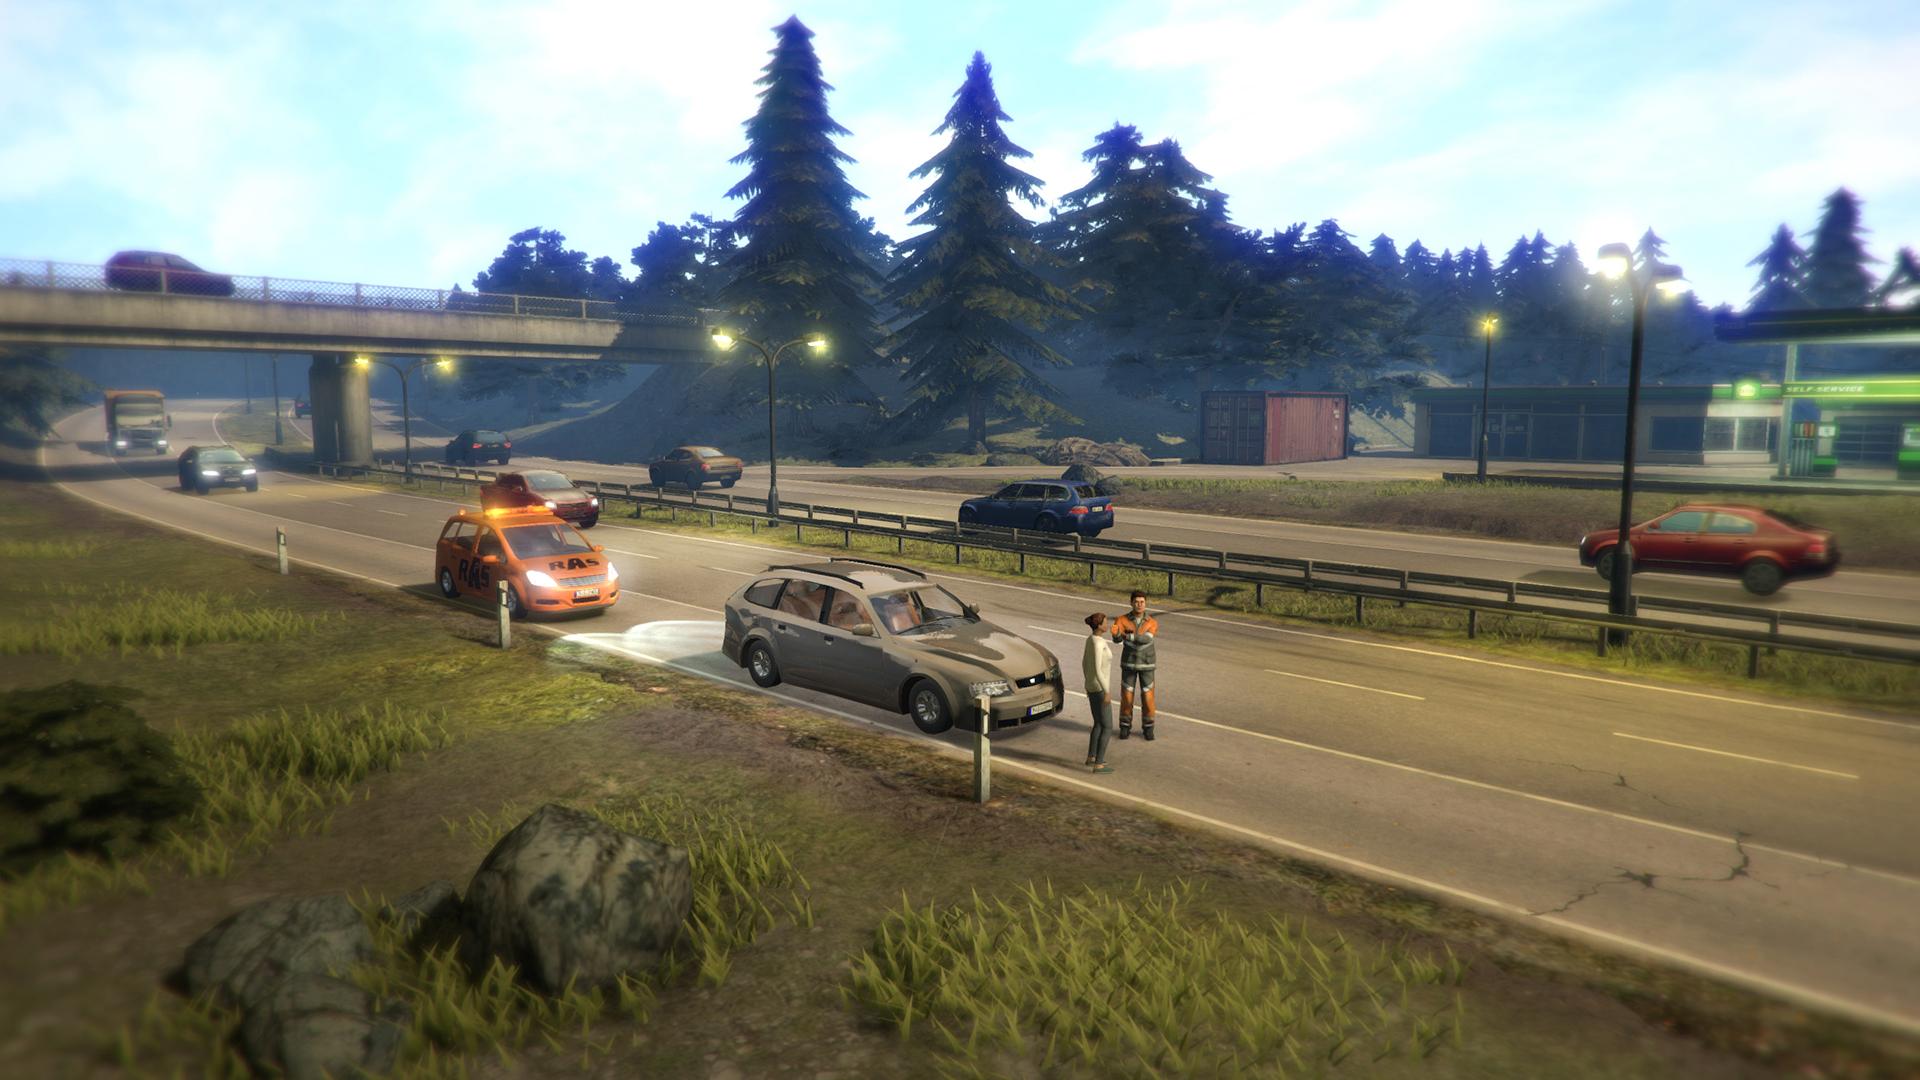 http://www.simulasyonturk.com/wp-content/uploads/2014/09/Roadside-Assistance-Simulator6.jpg